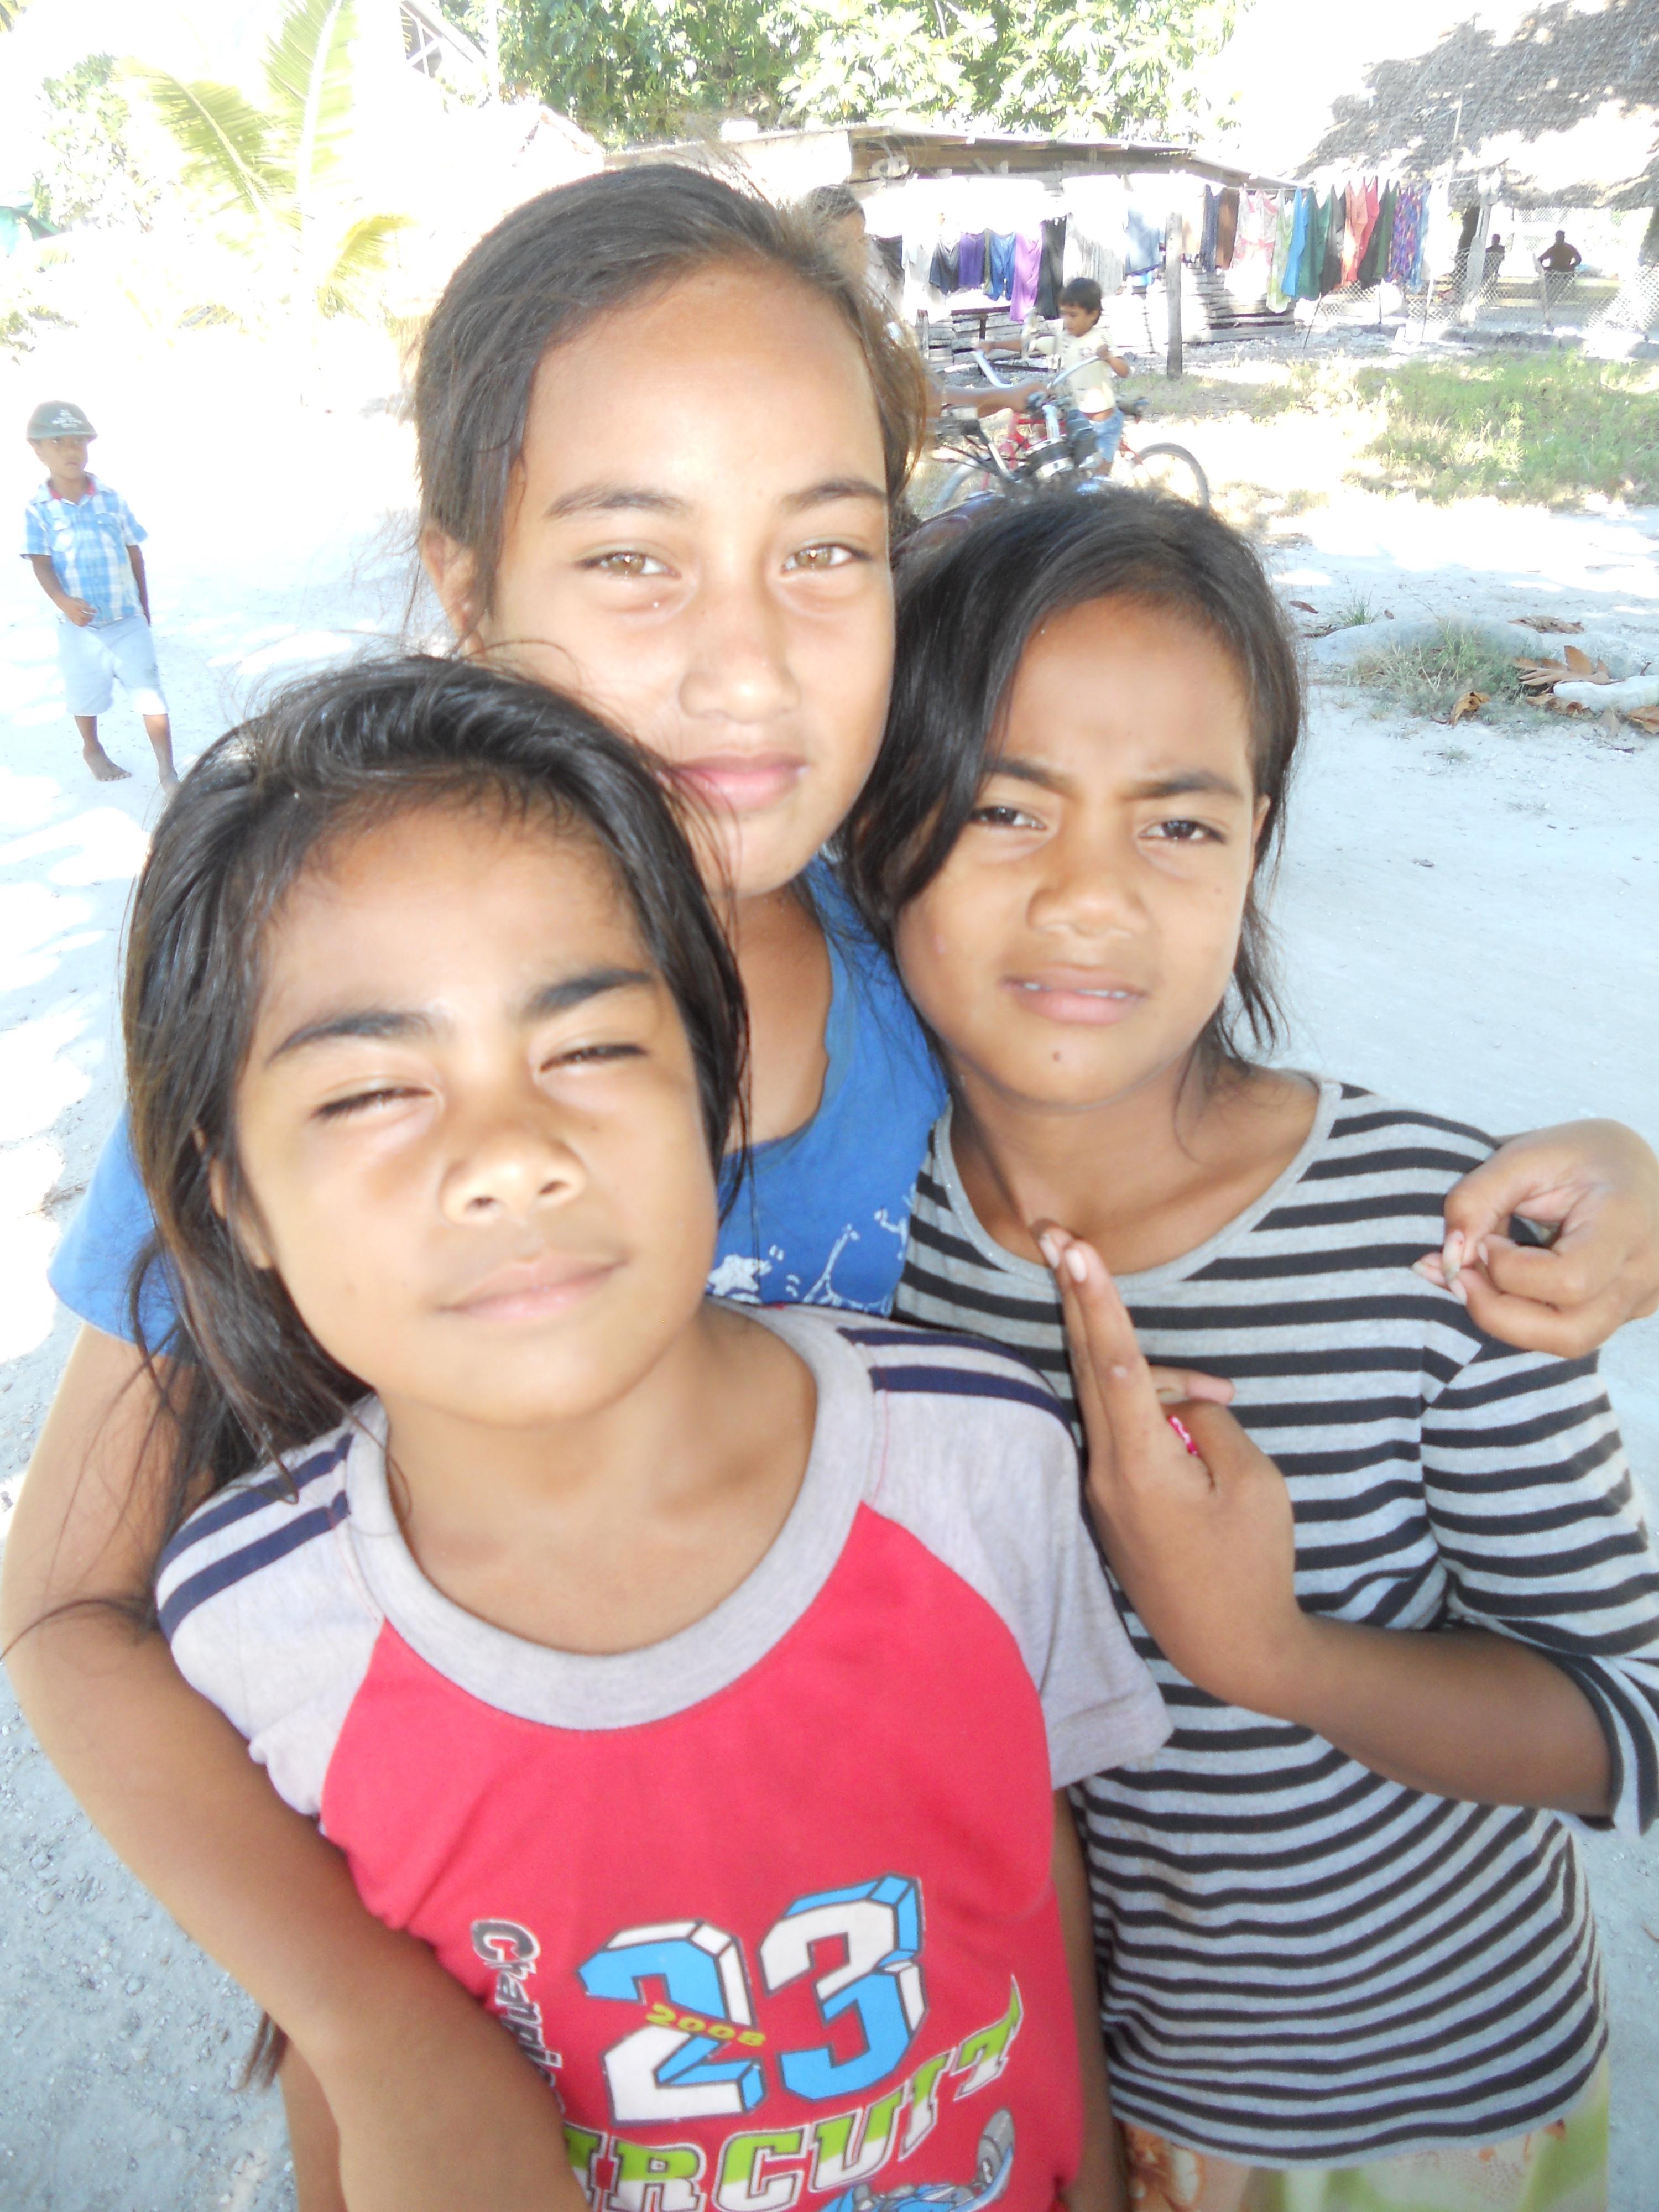 Kiribati girls